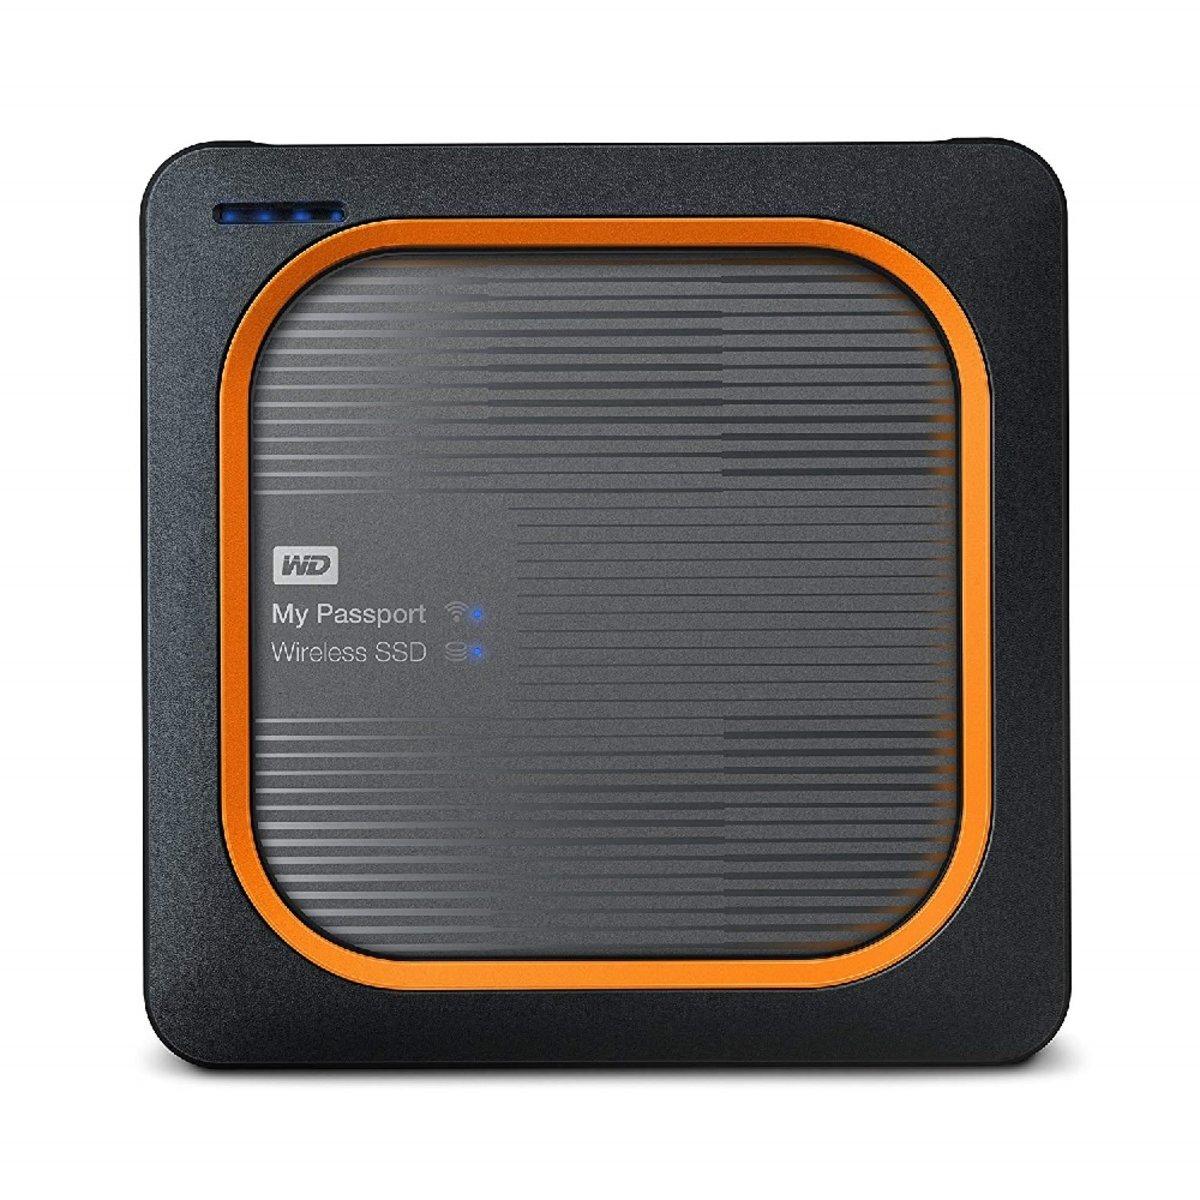 WD WESTEREN DIGITAL 2TB My Passport Wireless SSD External Portable Drive - WiFi USB 3.0